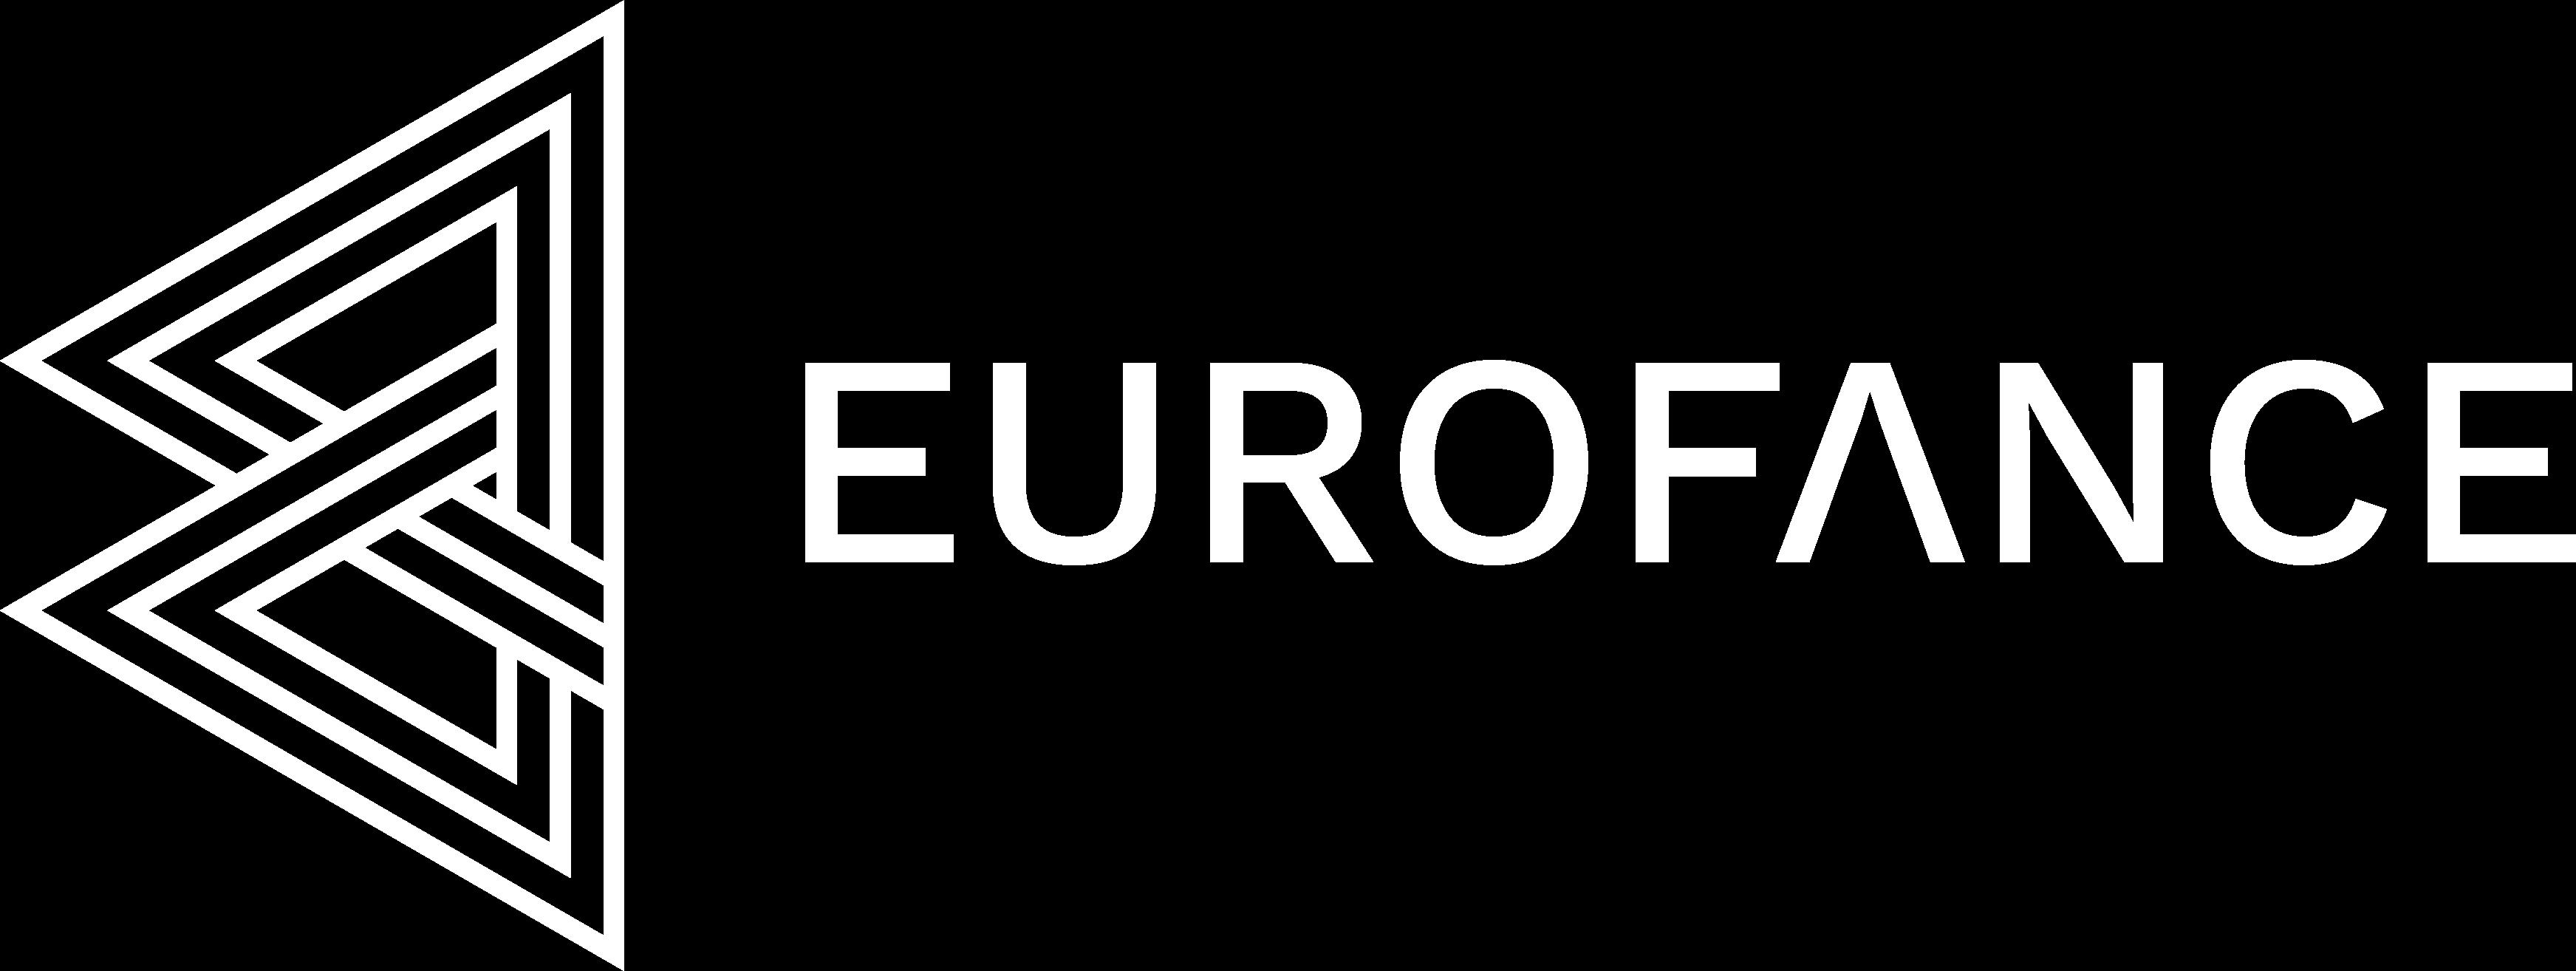 Eurofance Ogrodzenia - logo